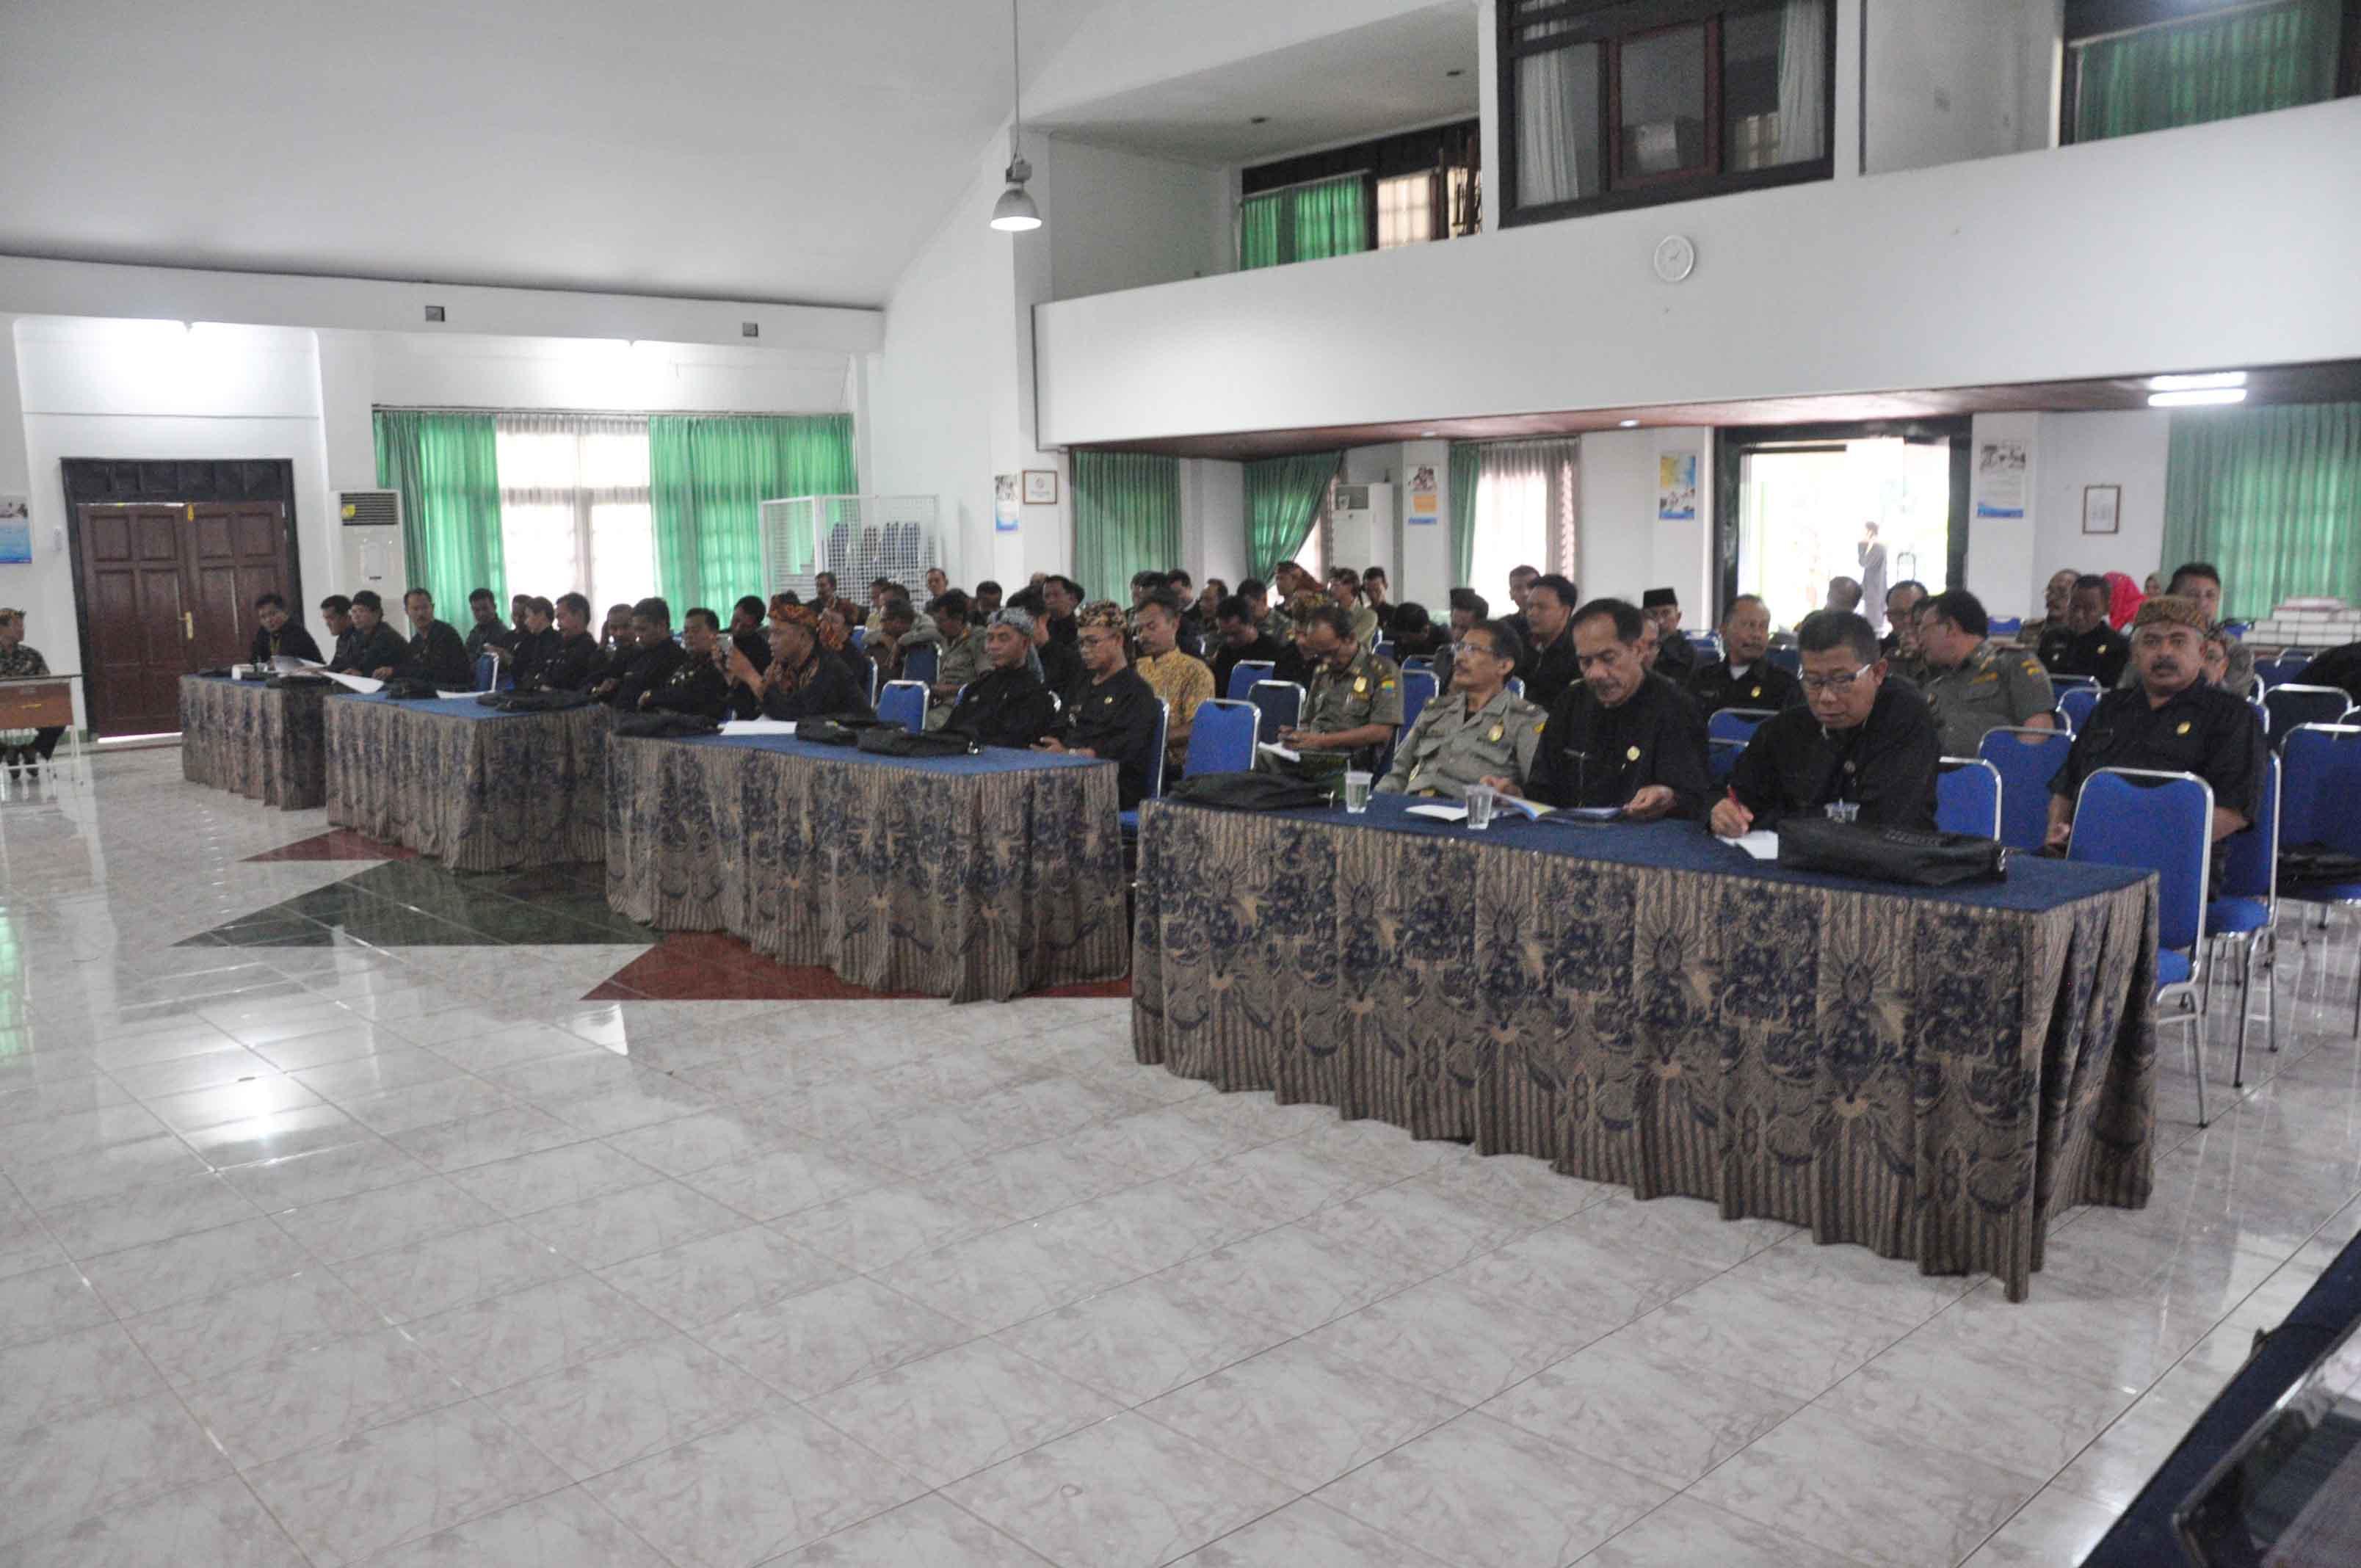 sekretaris-daerah-kab-cianjur-buka-sosialisasi-perijinan-bagi-aparat-kecamatan-desa-dan-pelaku-usaha